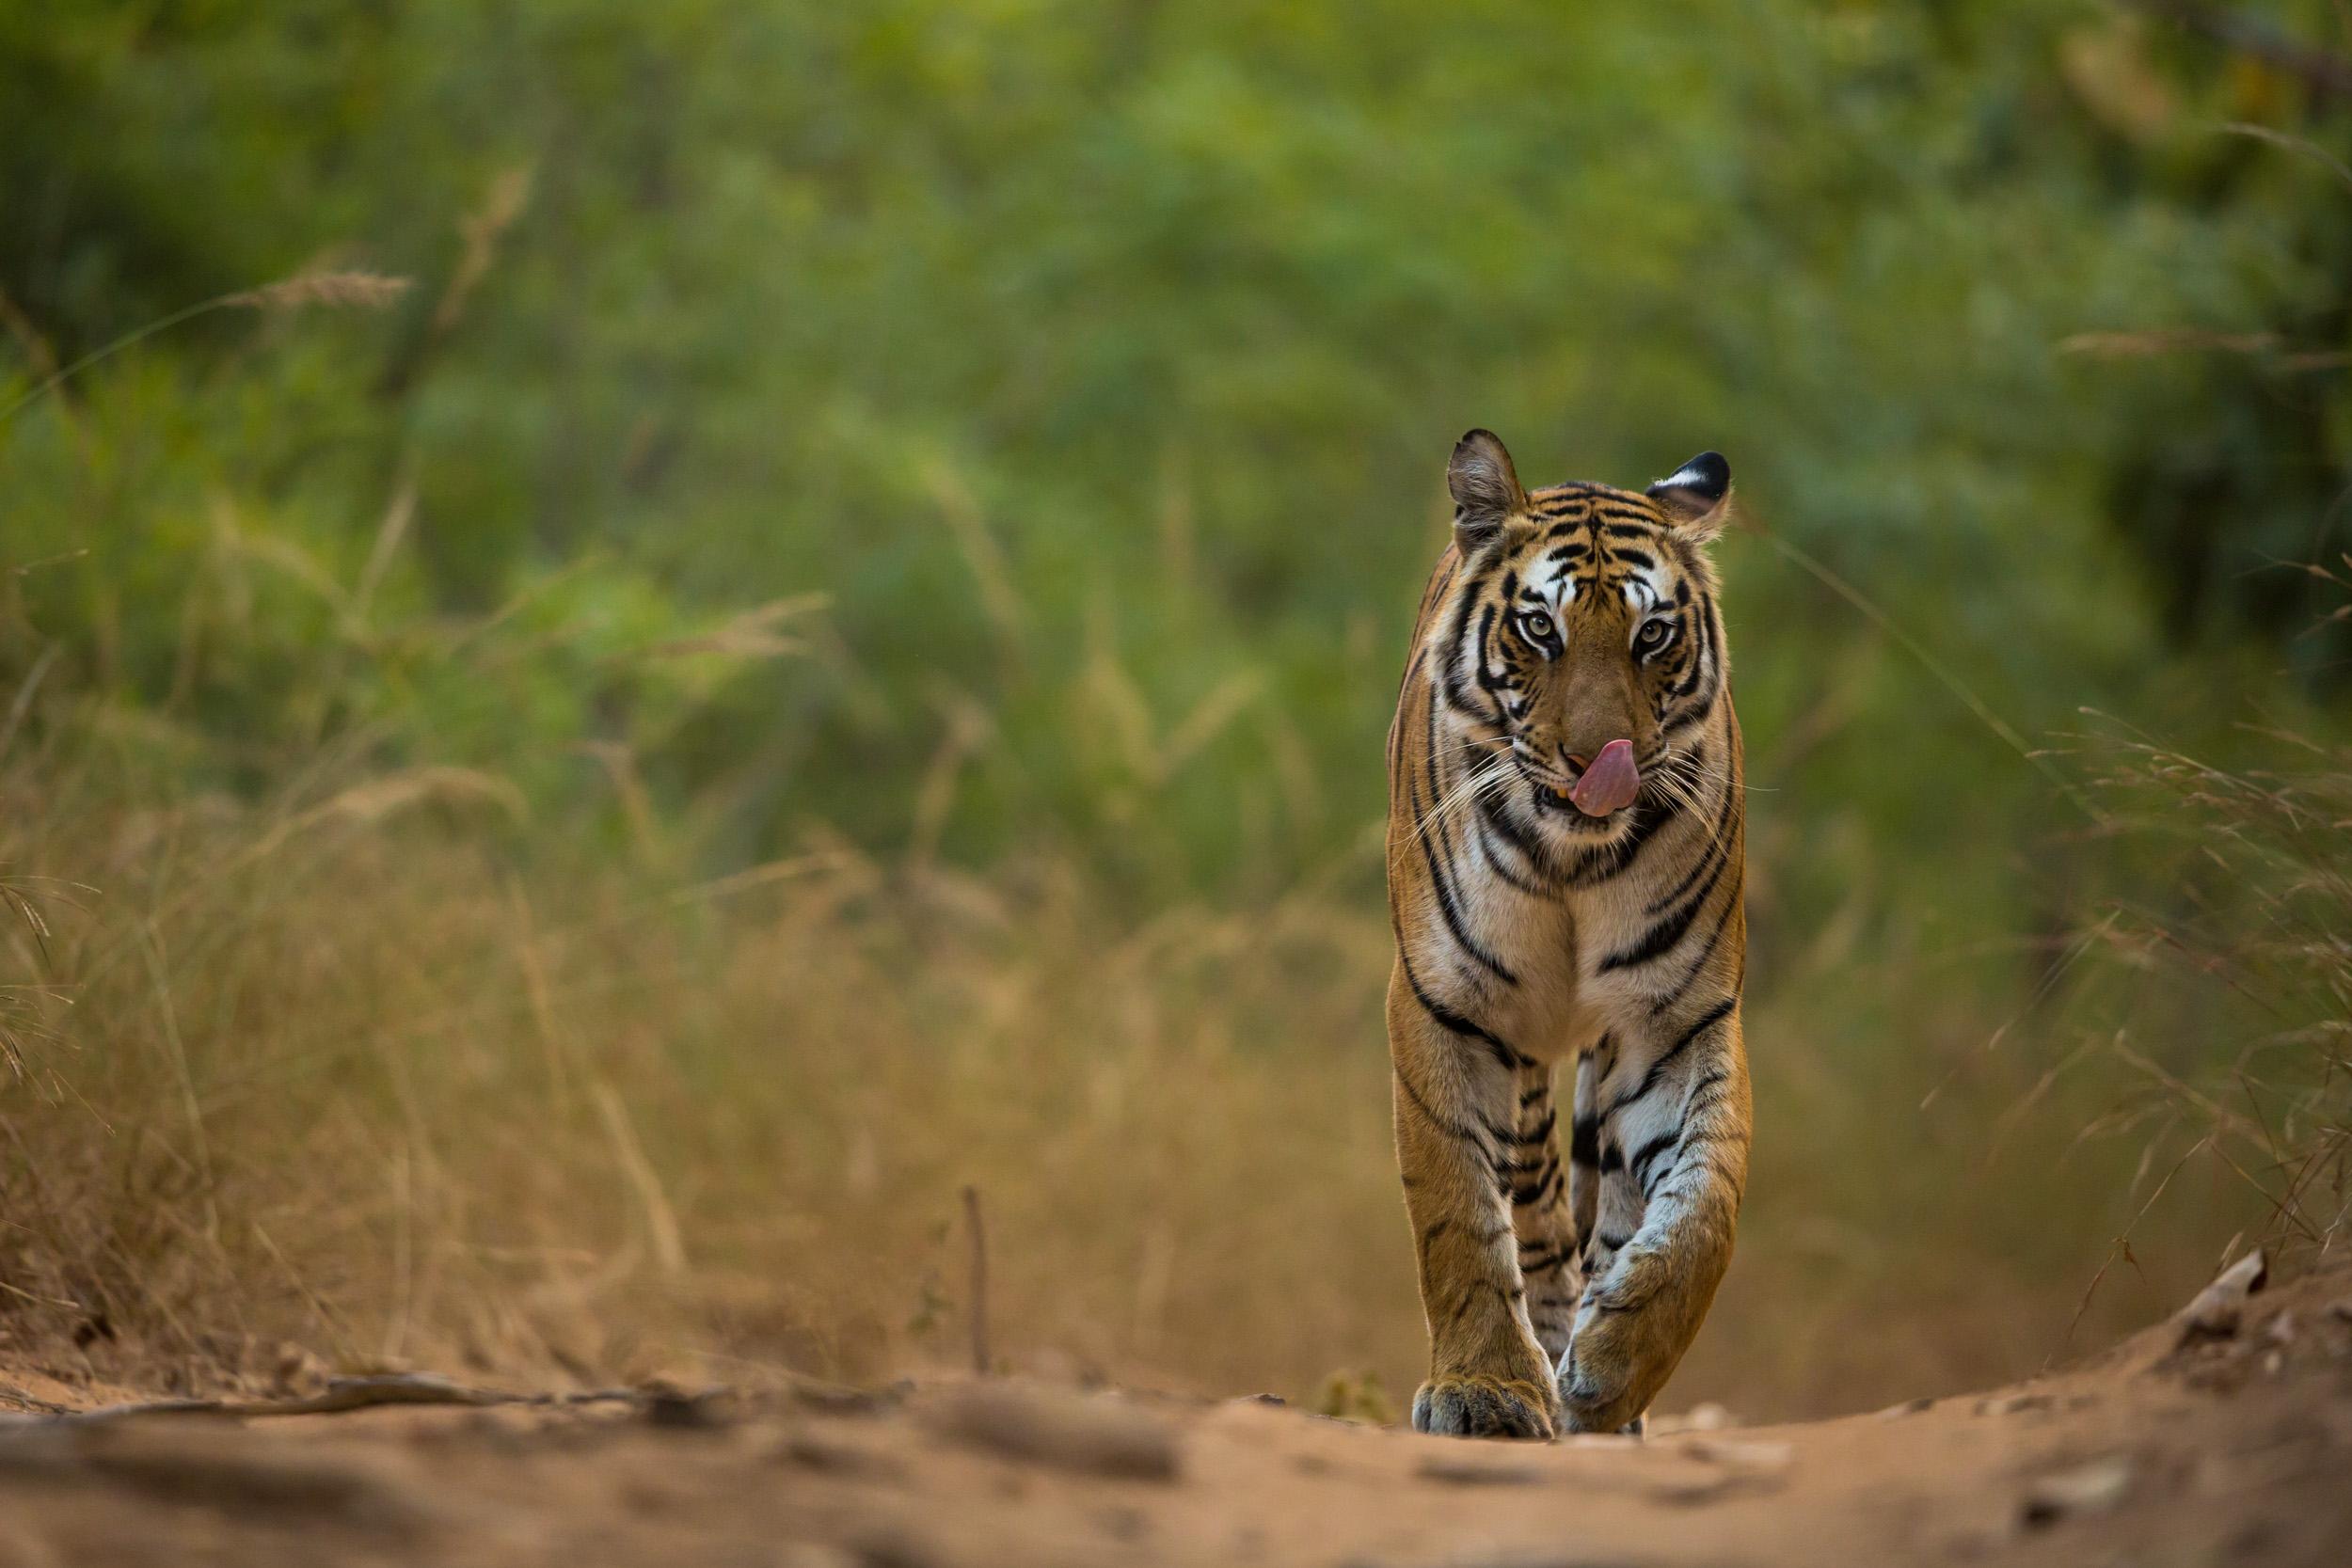 Tiger (Panthera tigris). CLICK IMAGE for full screen.